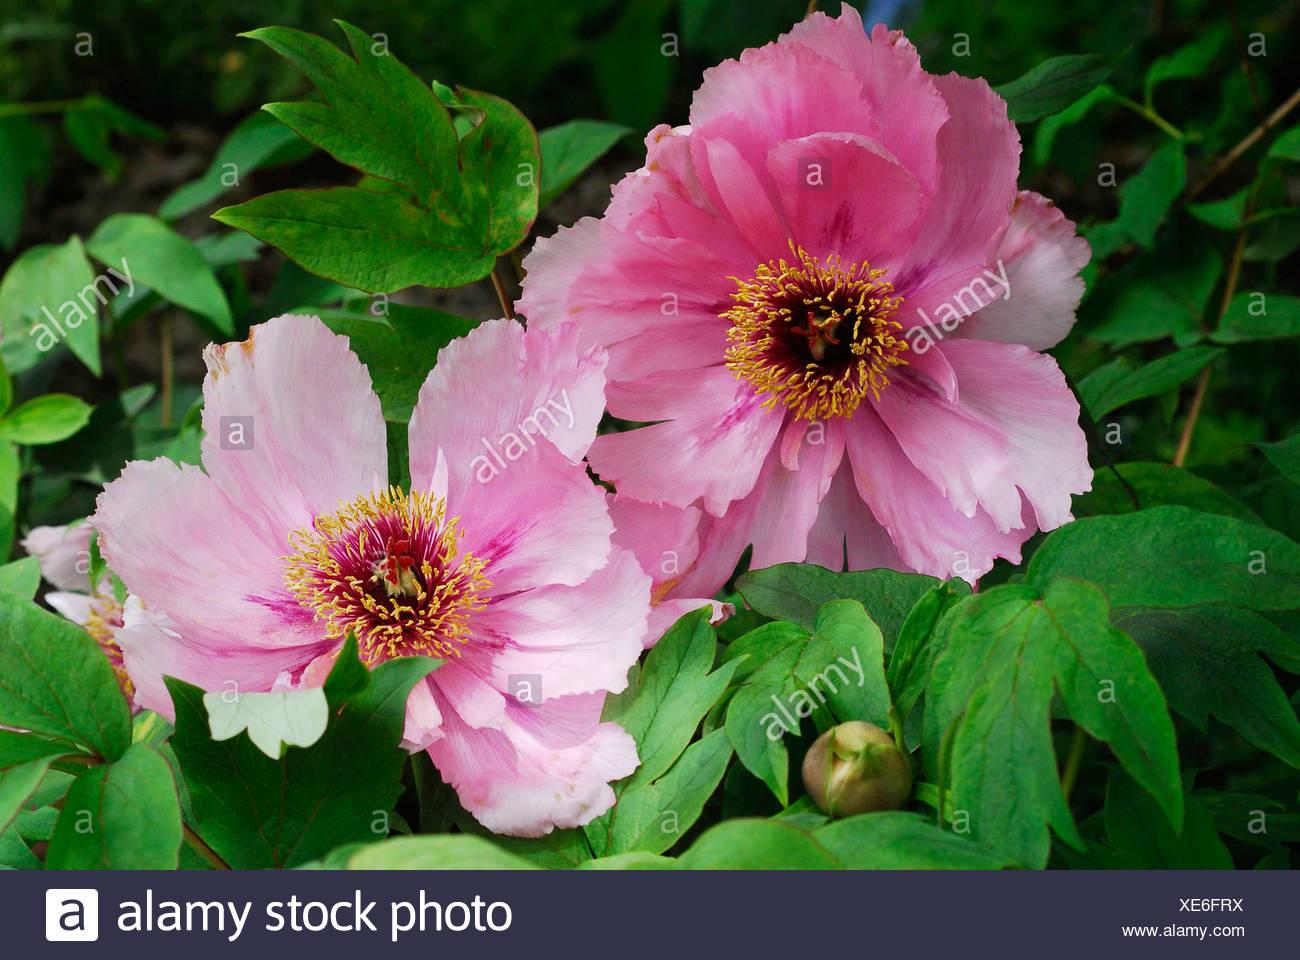 Pink red Peonies (Paeonia) Stock Photo